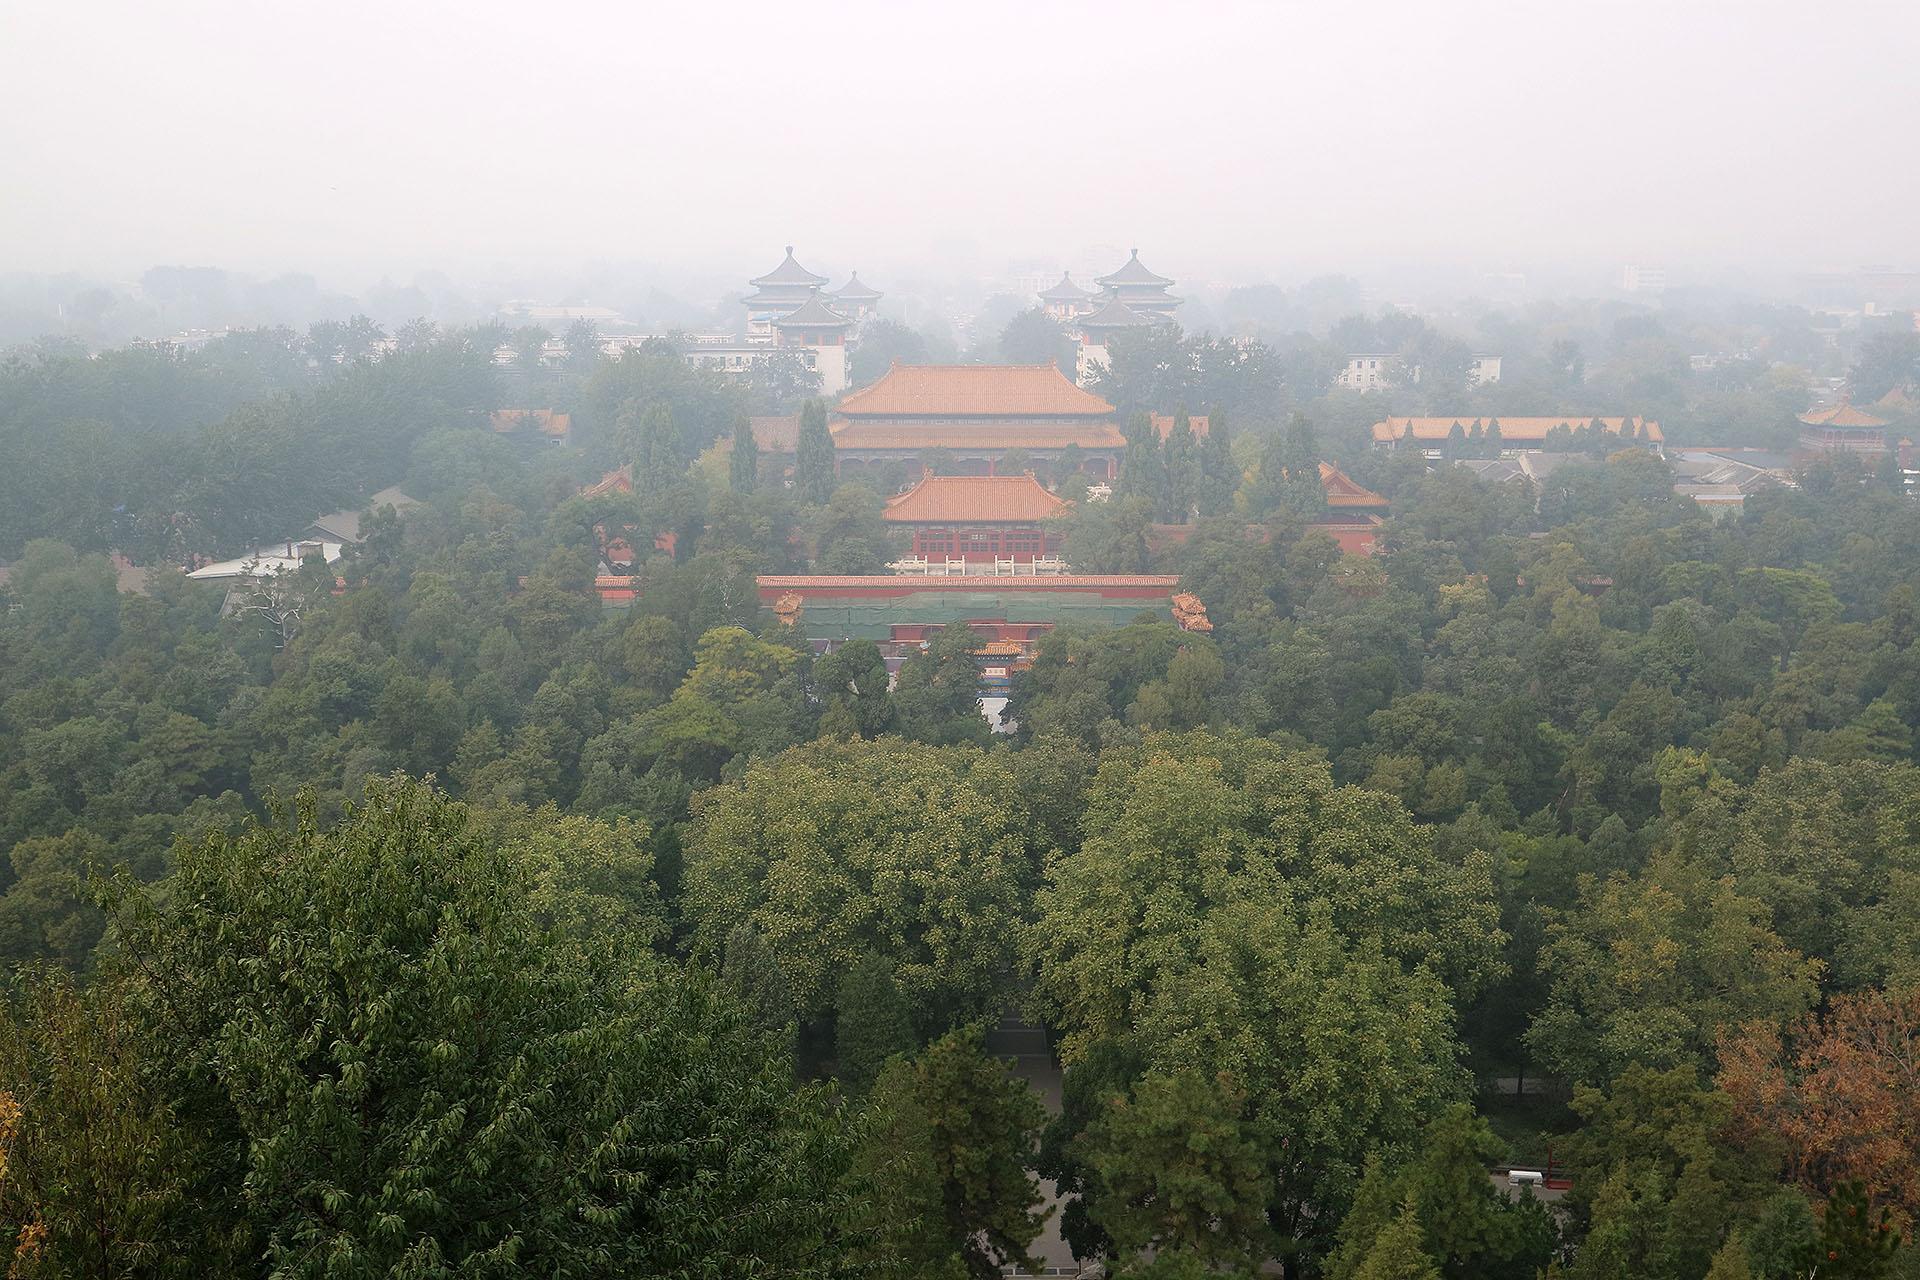 lantian作品:楼阁尽在霾雾中